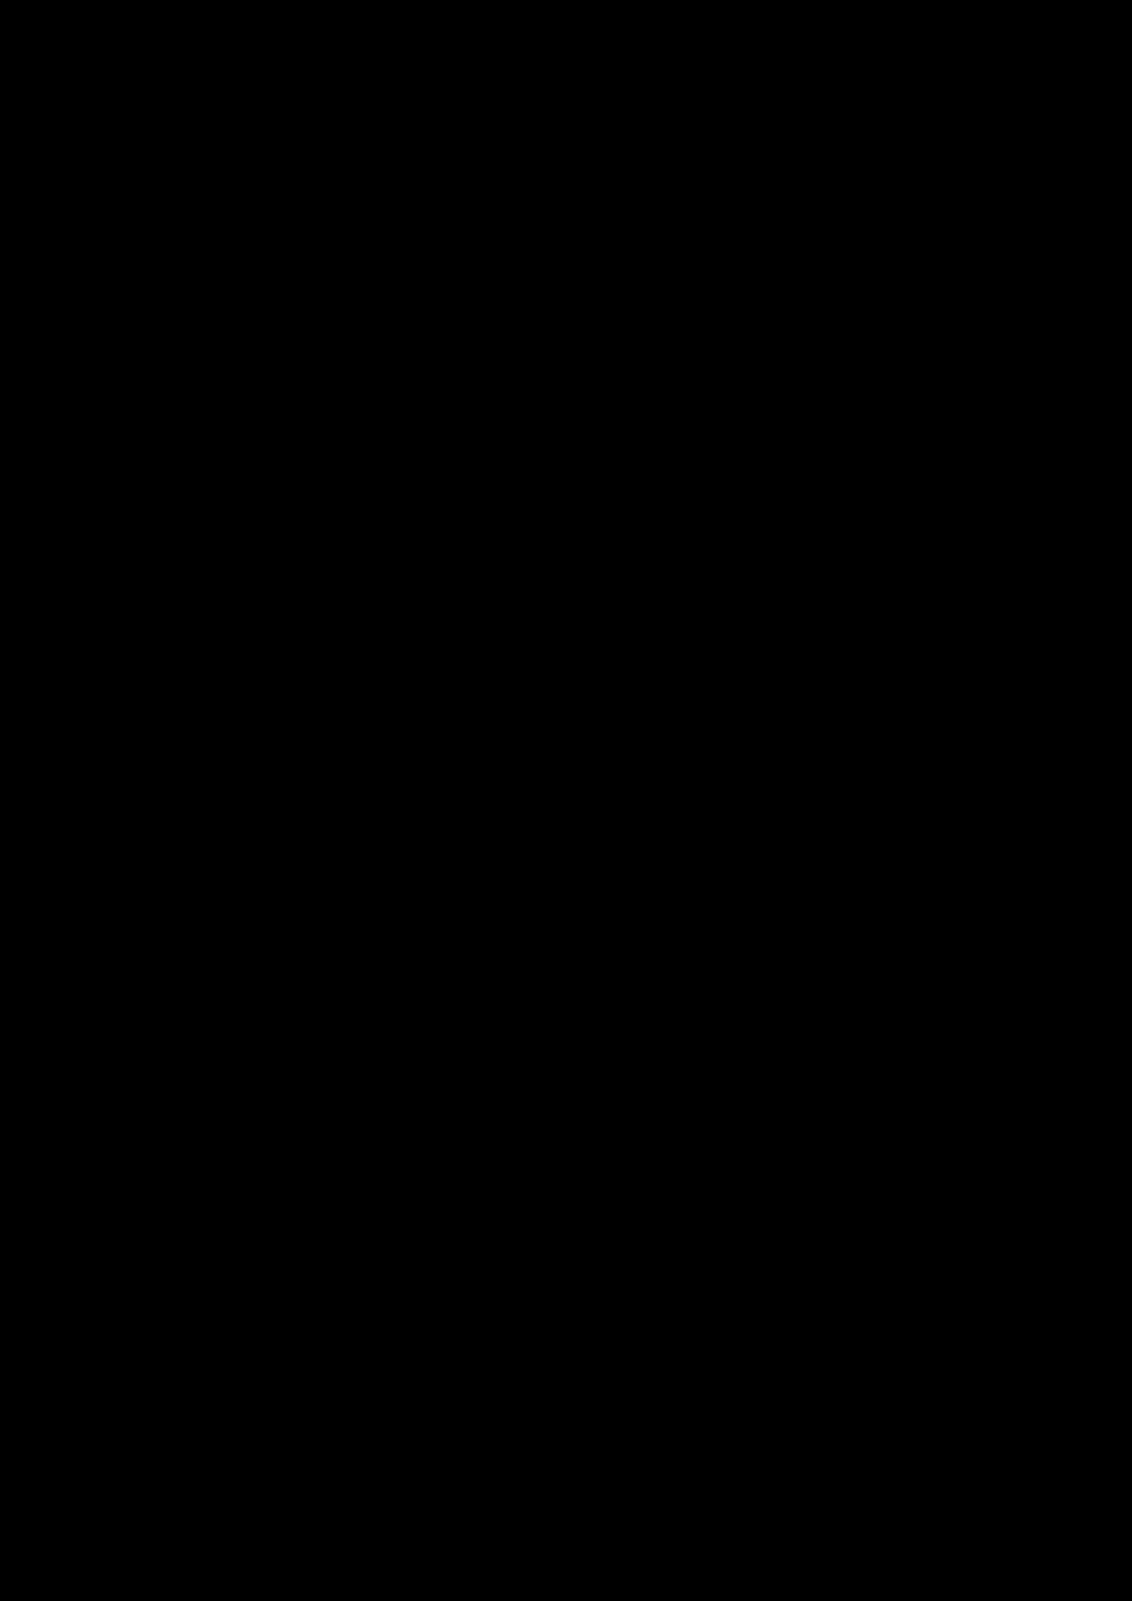 Belyiy sokol slide, Image 81